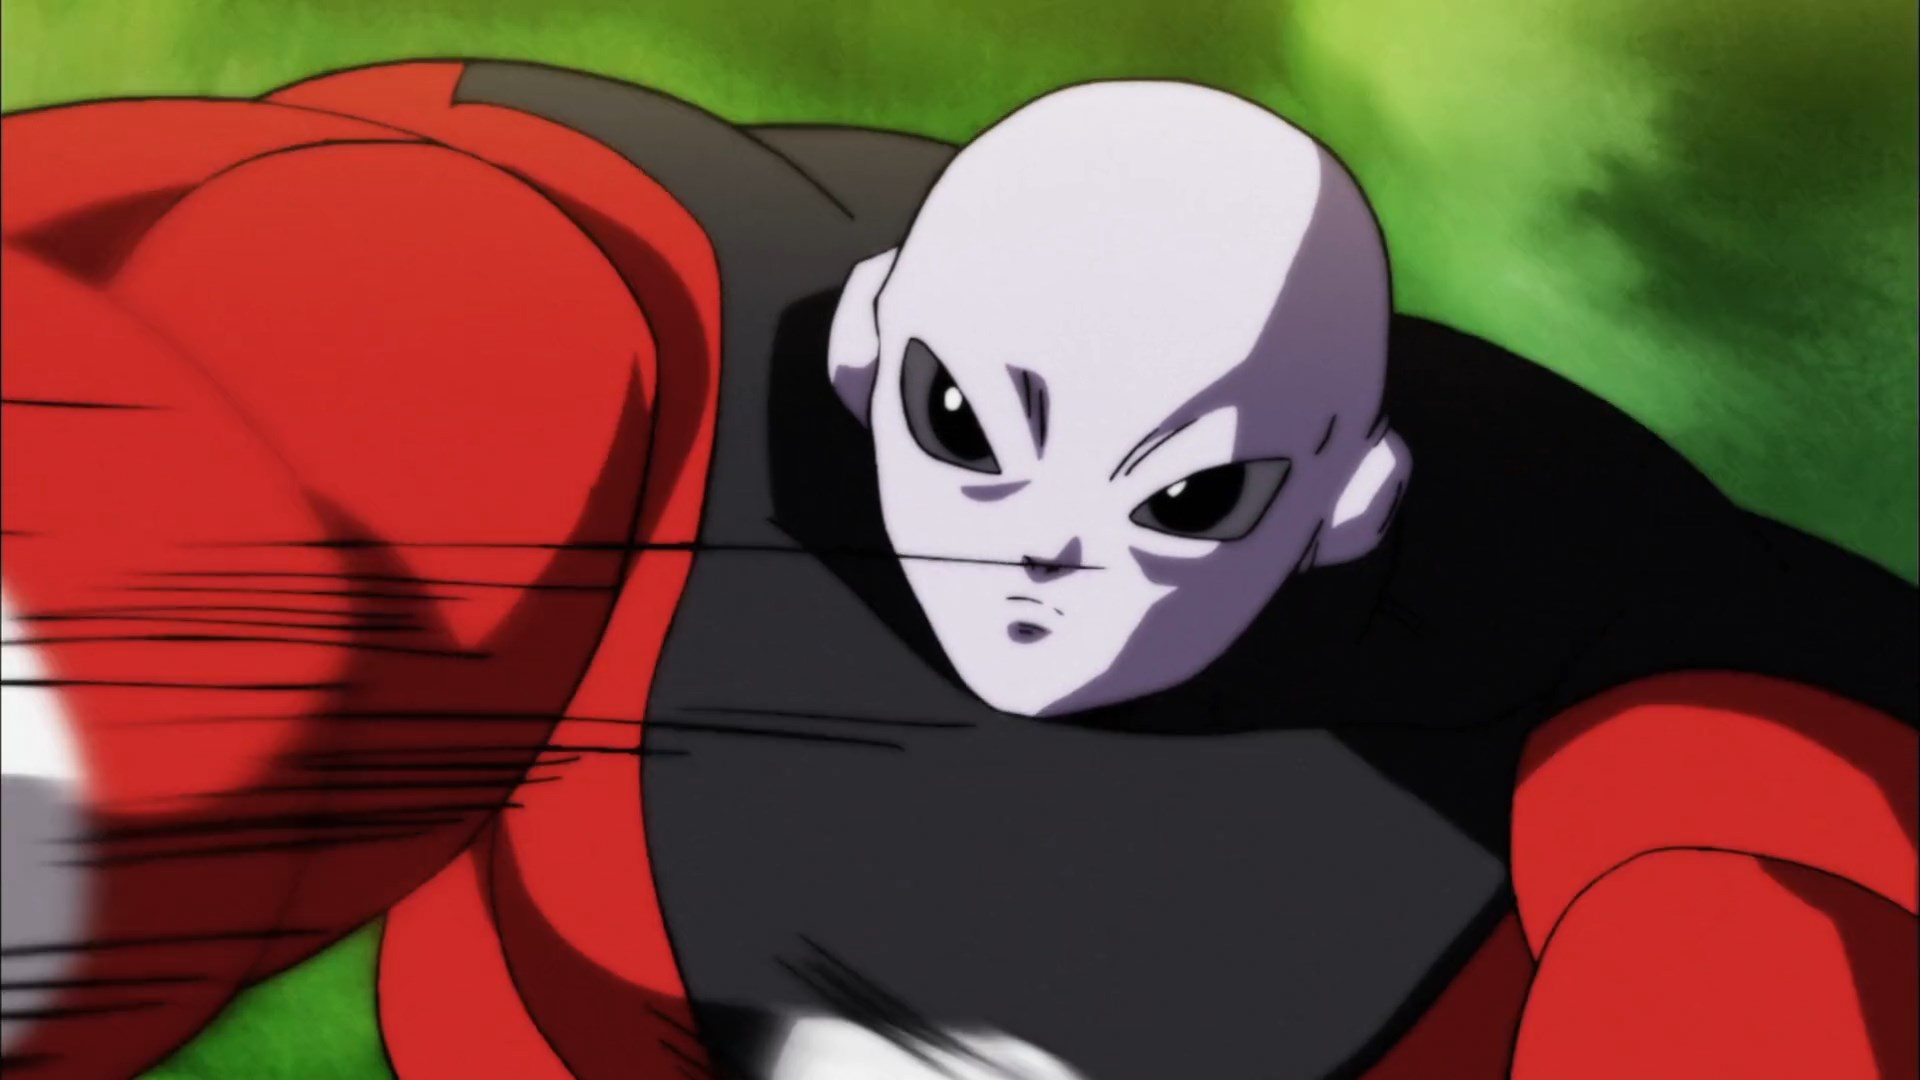 [HorribleSubs] Dragon Ball Super - 121 [1080p].mkv_snapshot_23.14